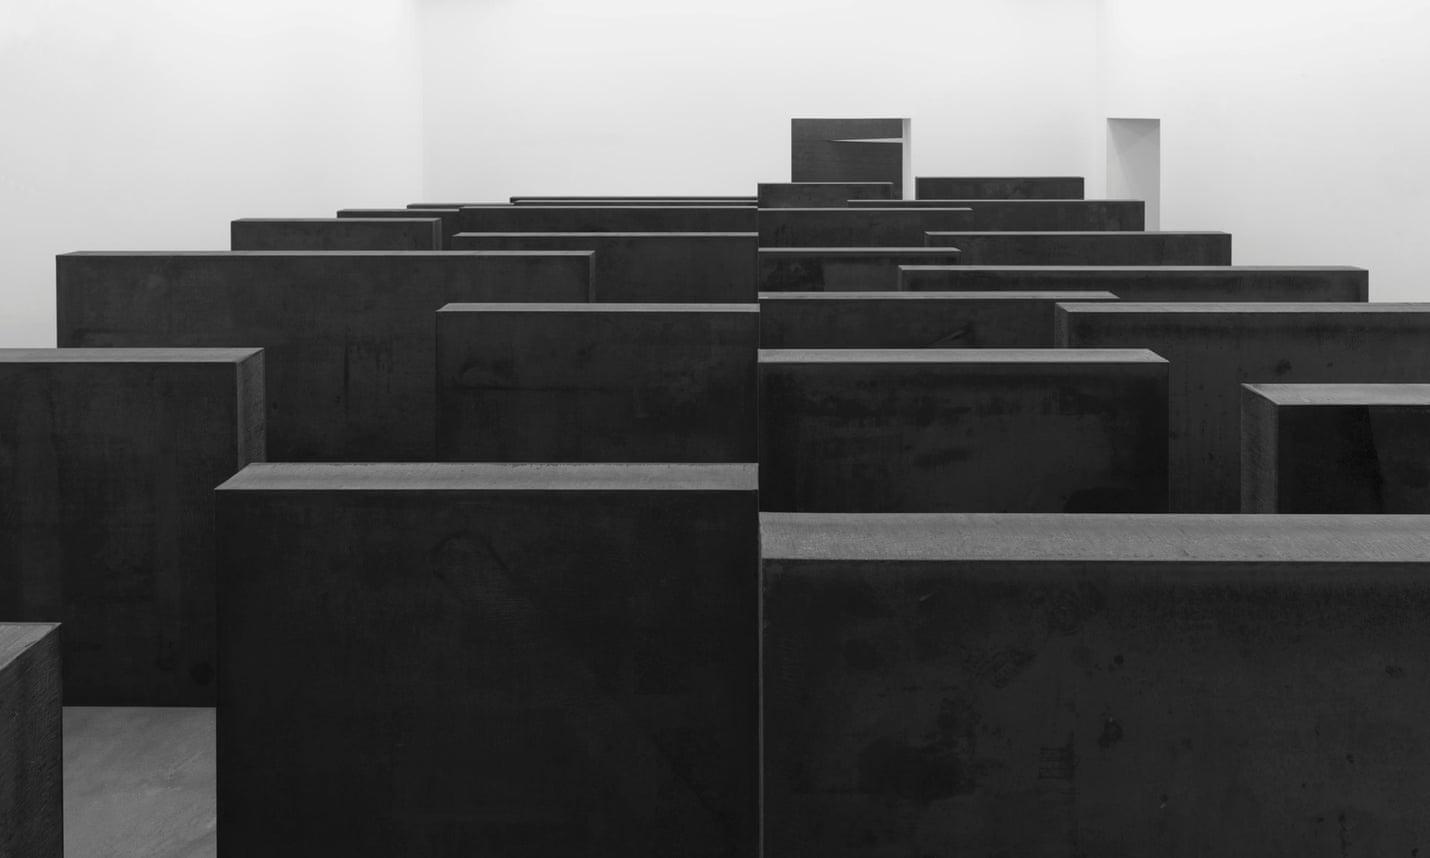 Richard Serra Ramble